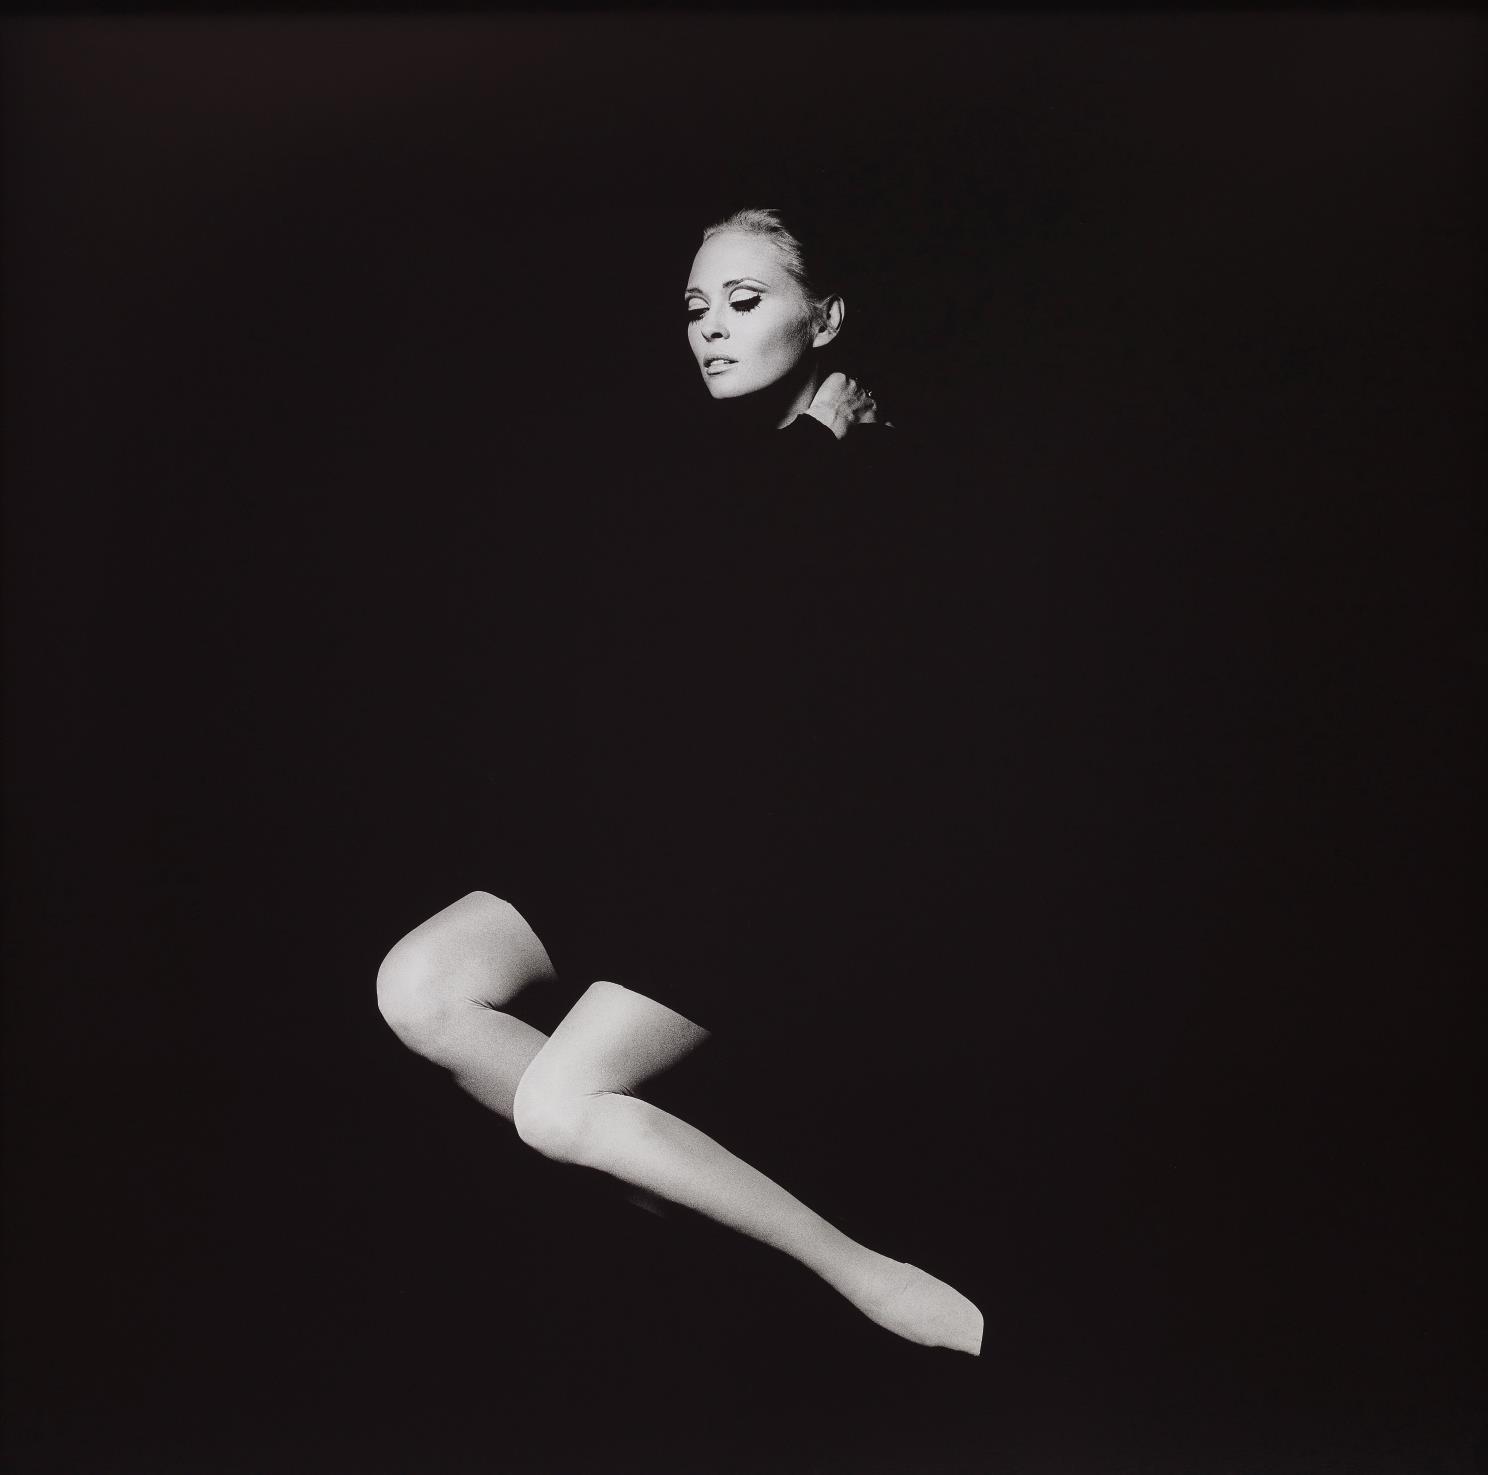 Jerry Schatzberg-Faye Dunaway-1968